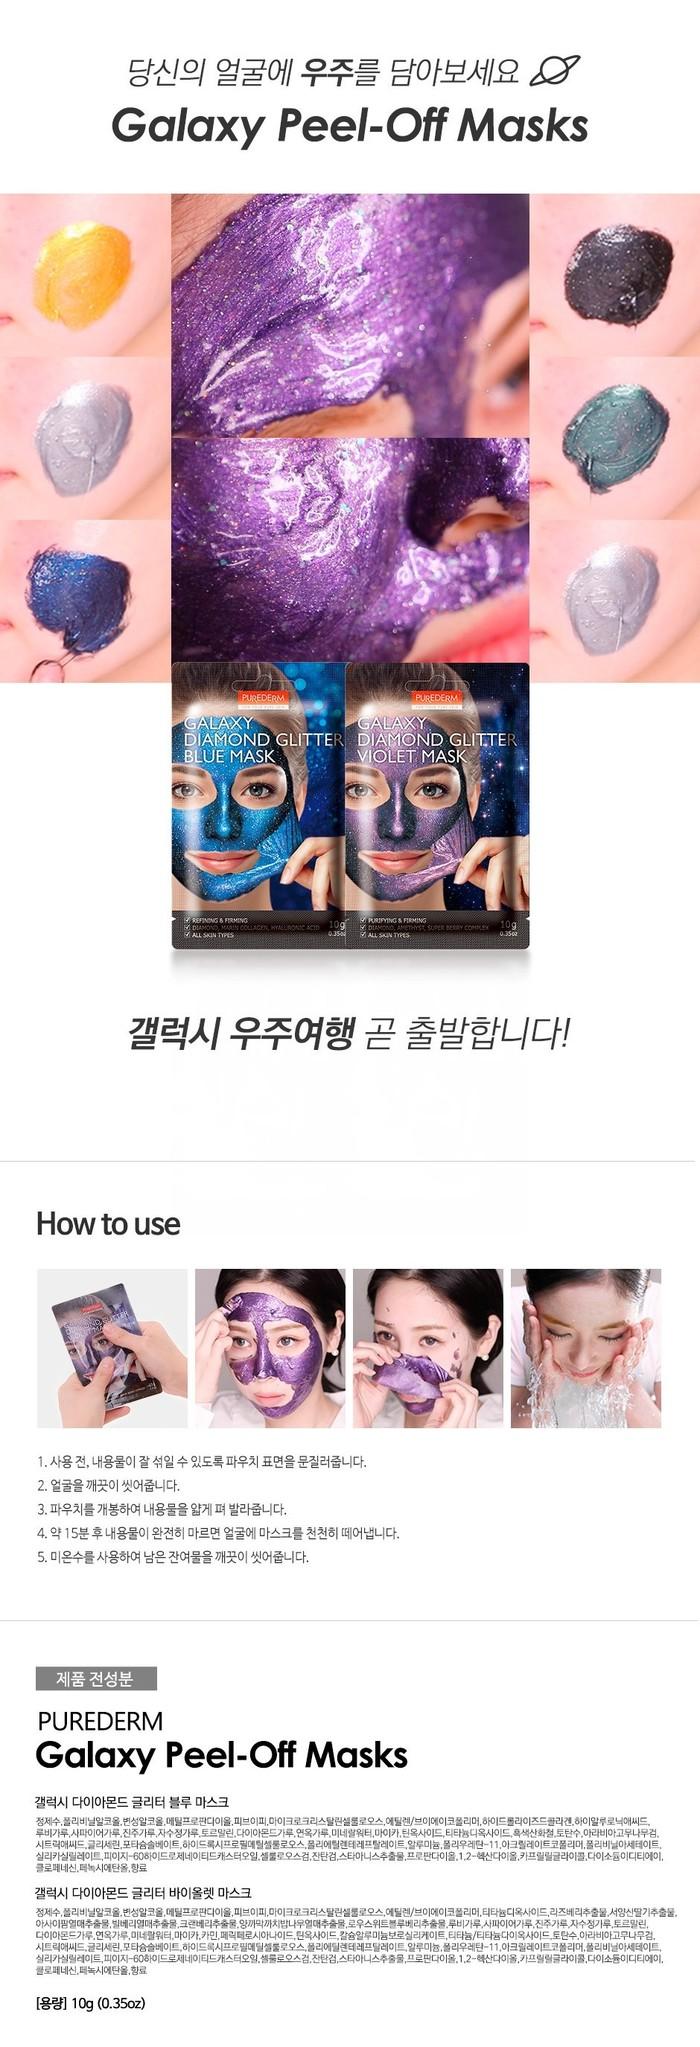 Galaxy Diamond Glitter Mask  #Violet-5